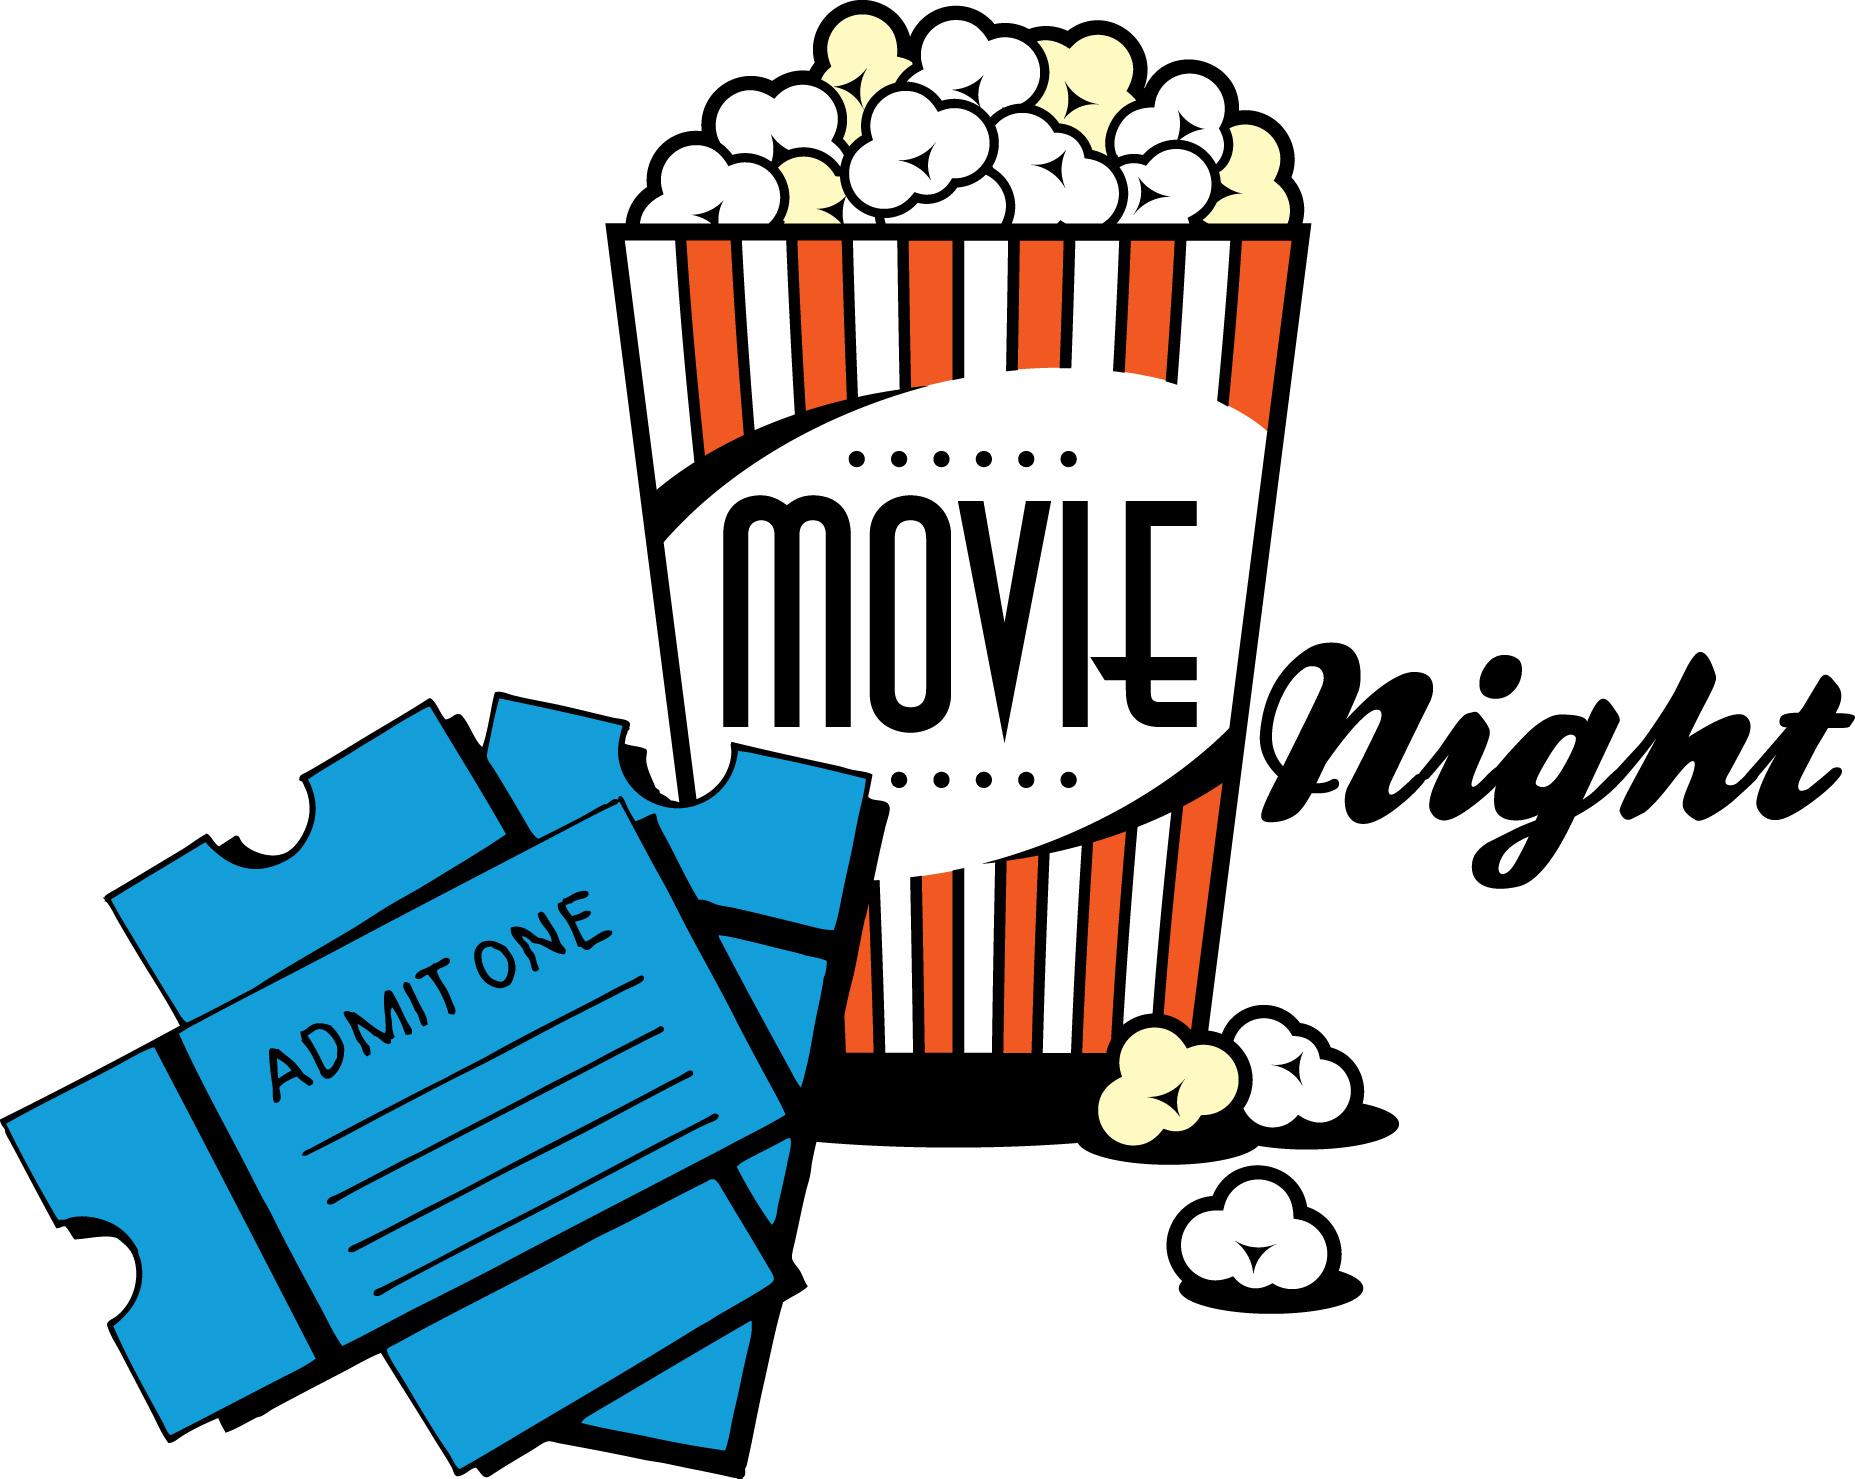 College-Aged Movie Night